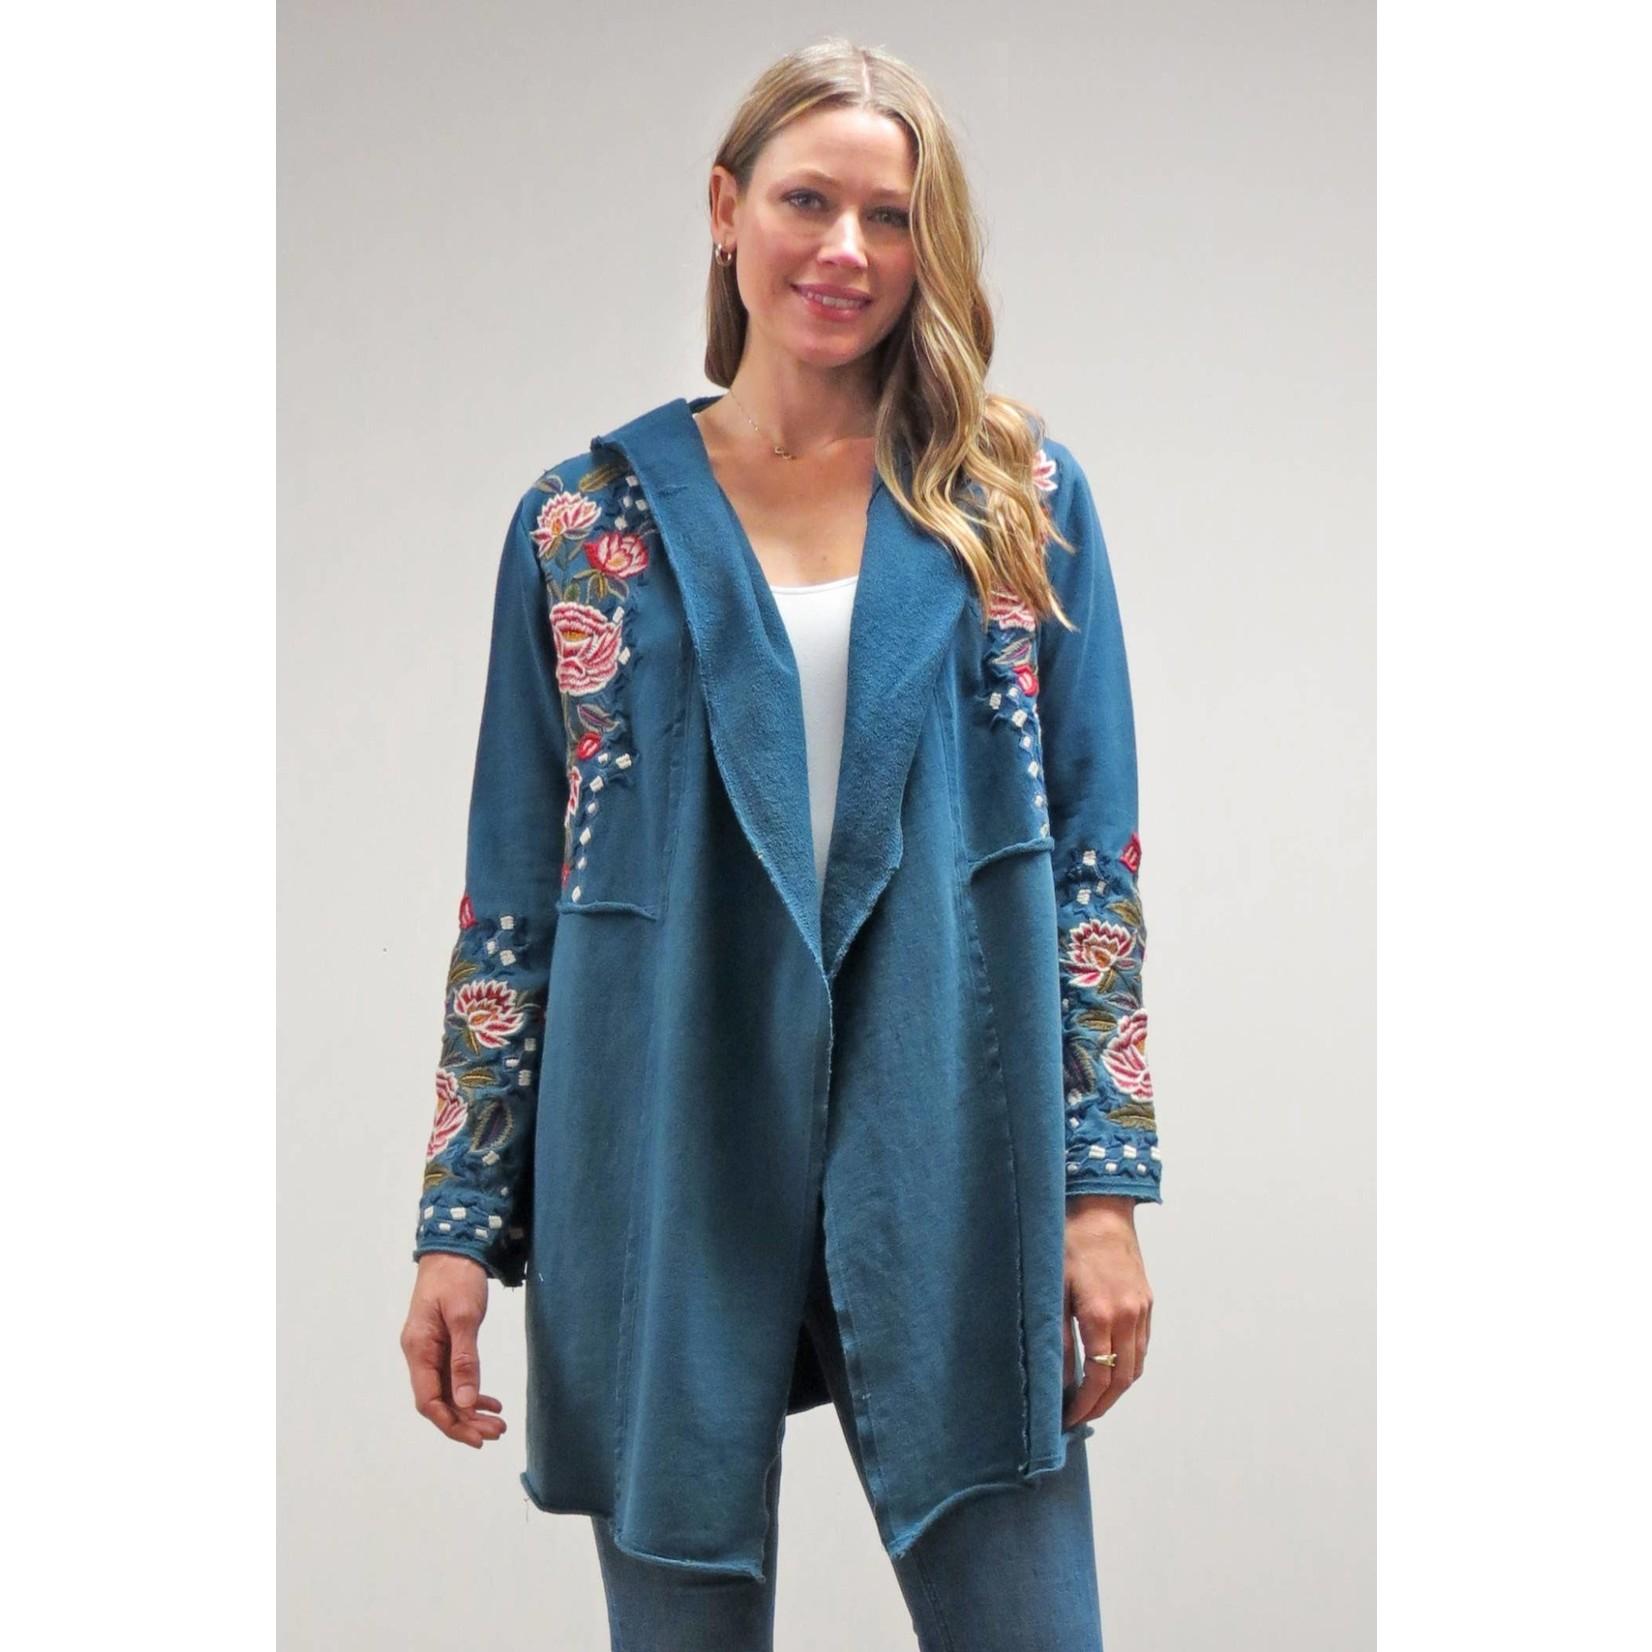 Caite Brenna Dk Teal Tye-Dye Hooded Jacket w/ Embr Detail